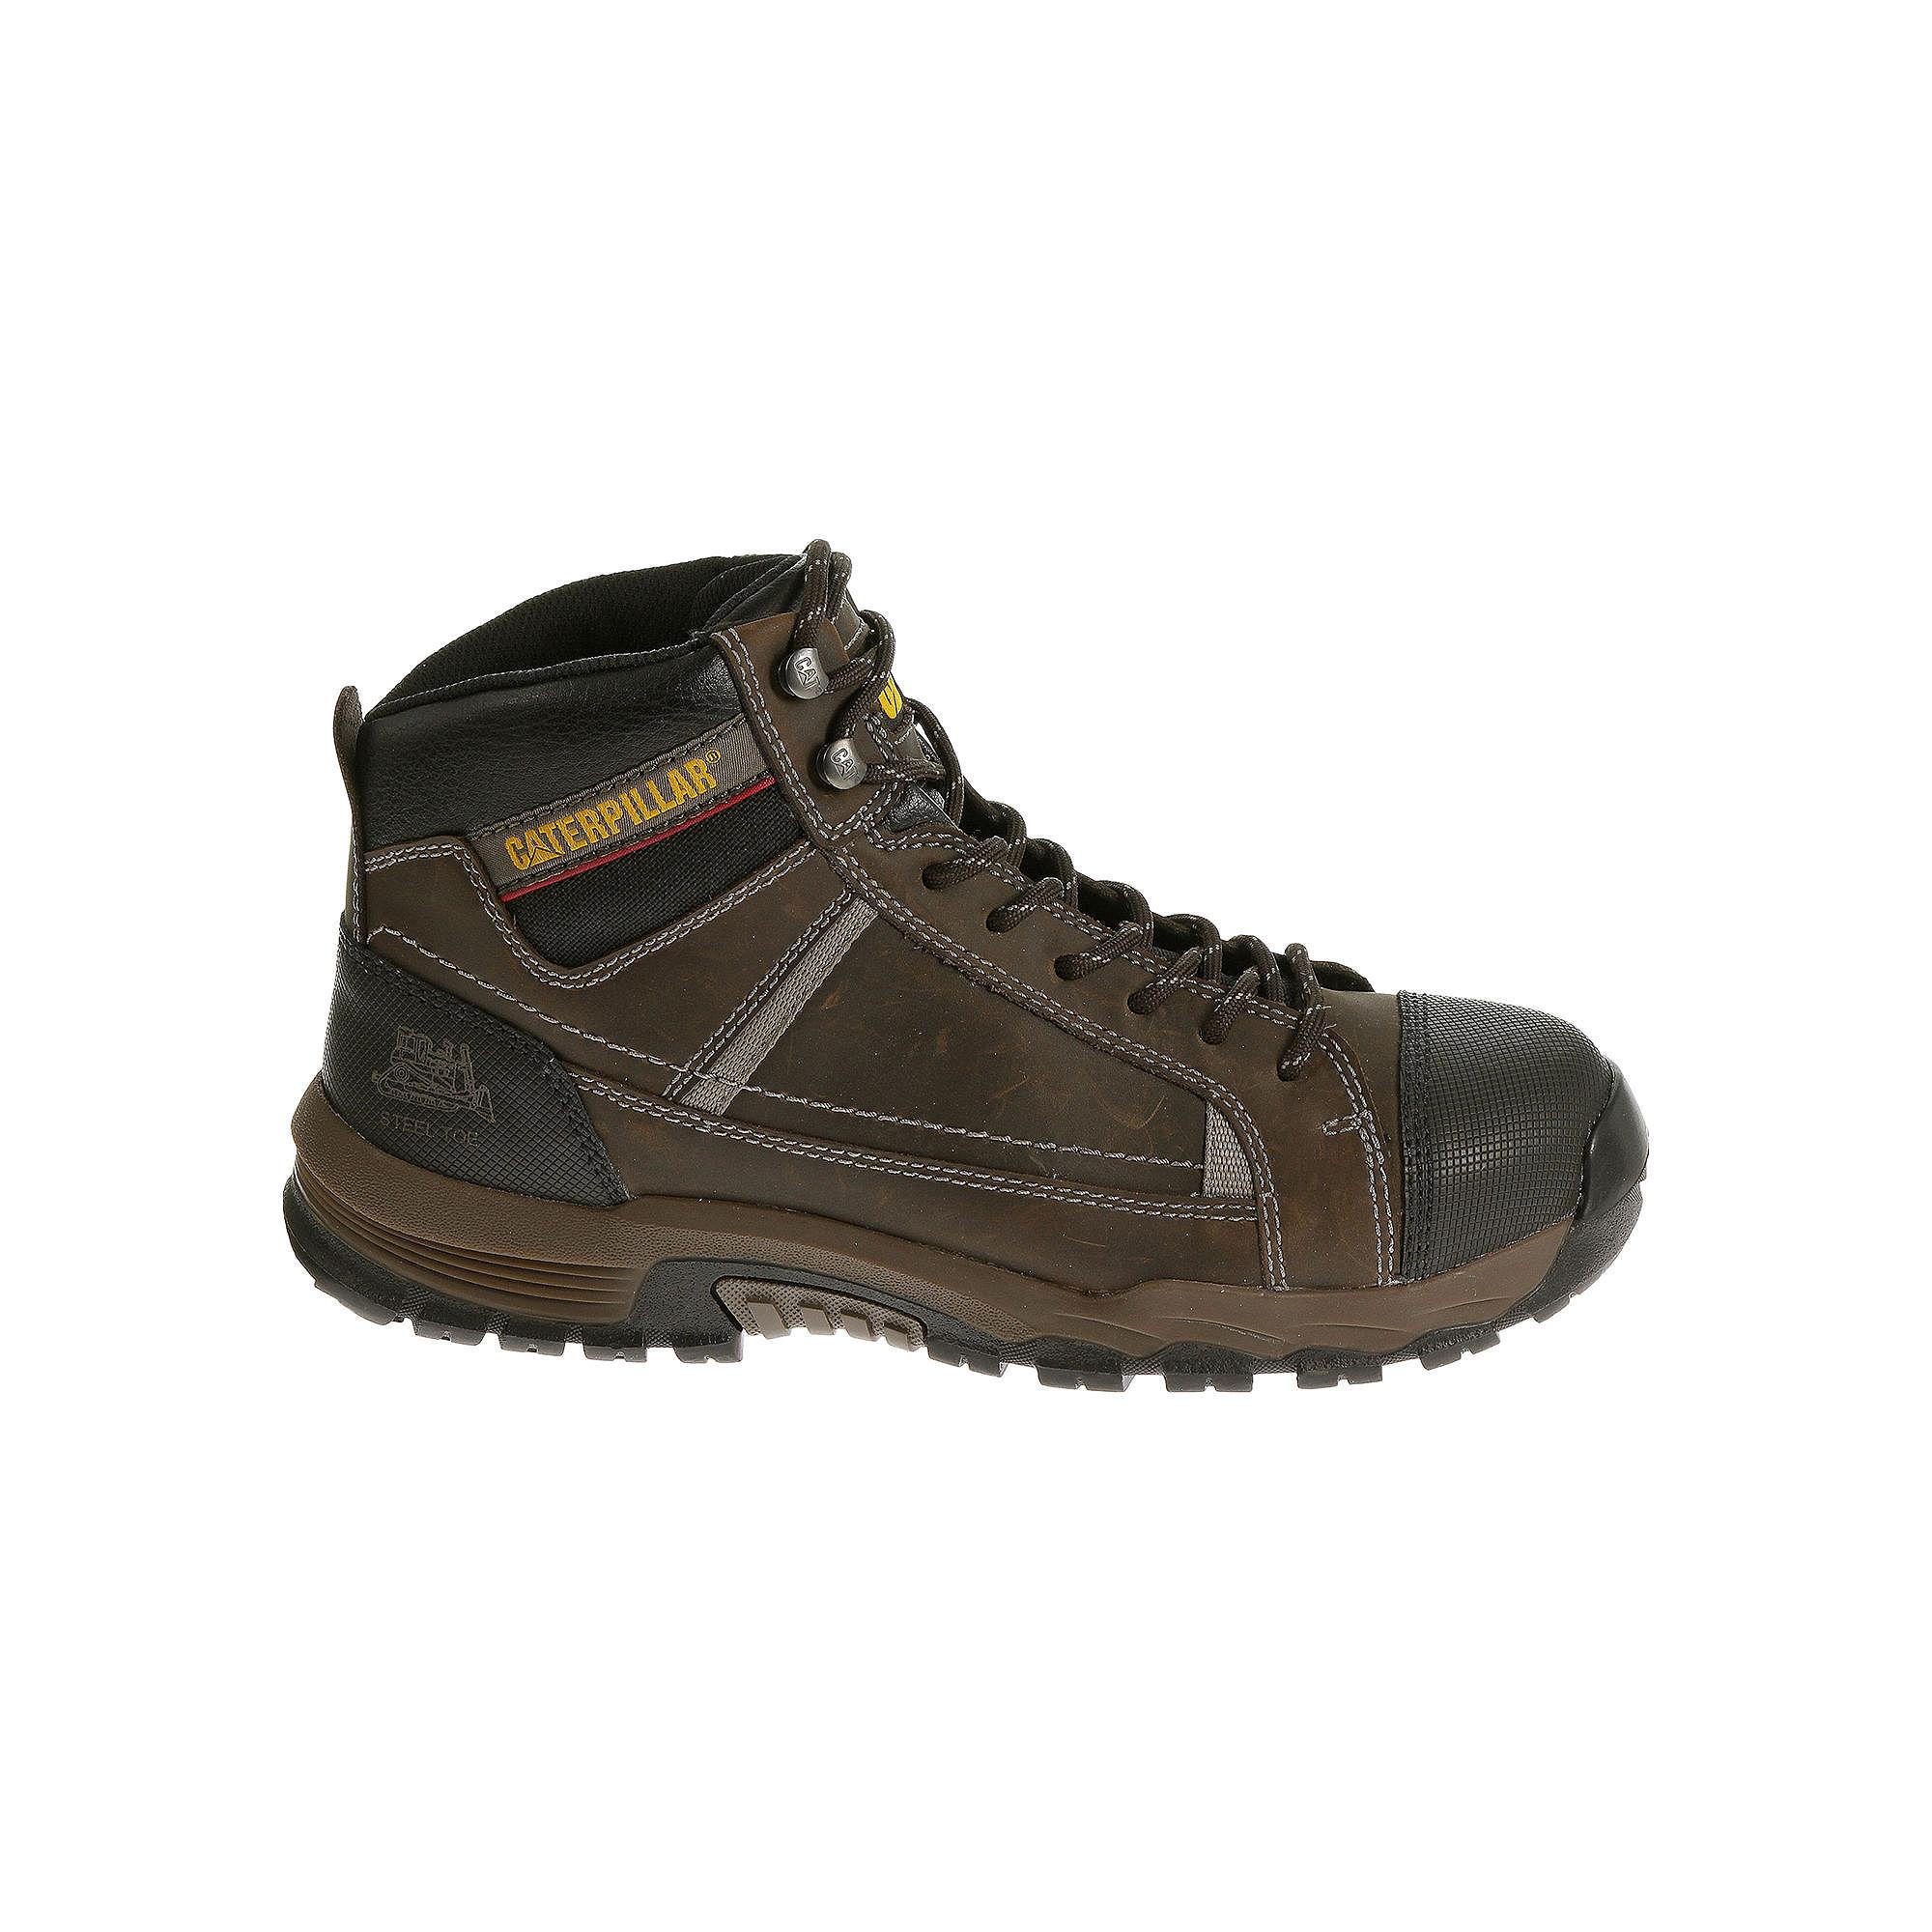 CAT Regulator EH Mens Steel-Toe Slip-Resistant Work Boots